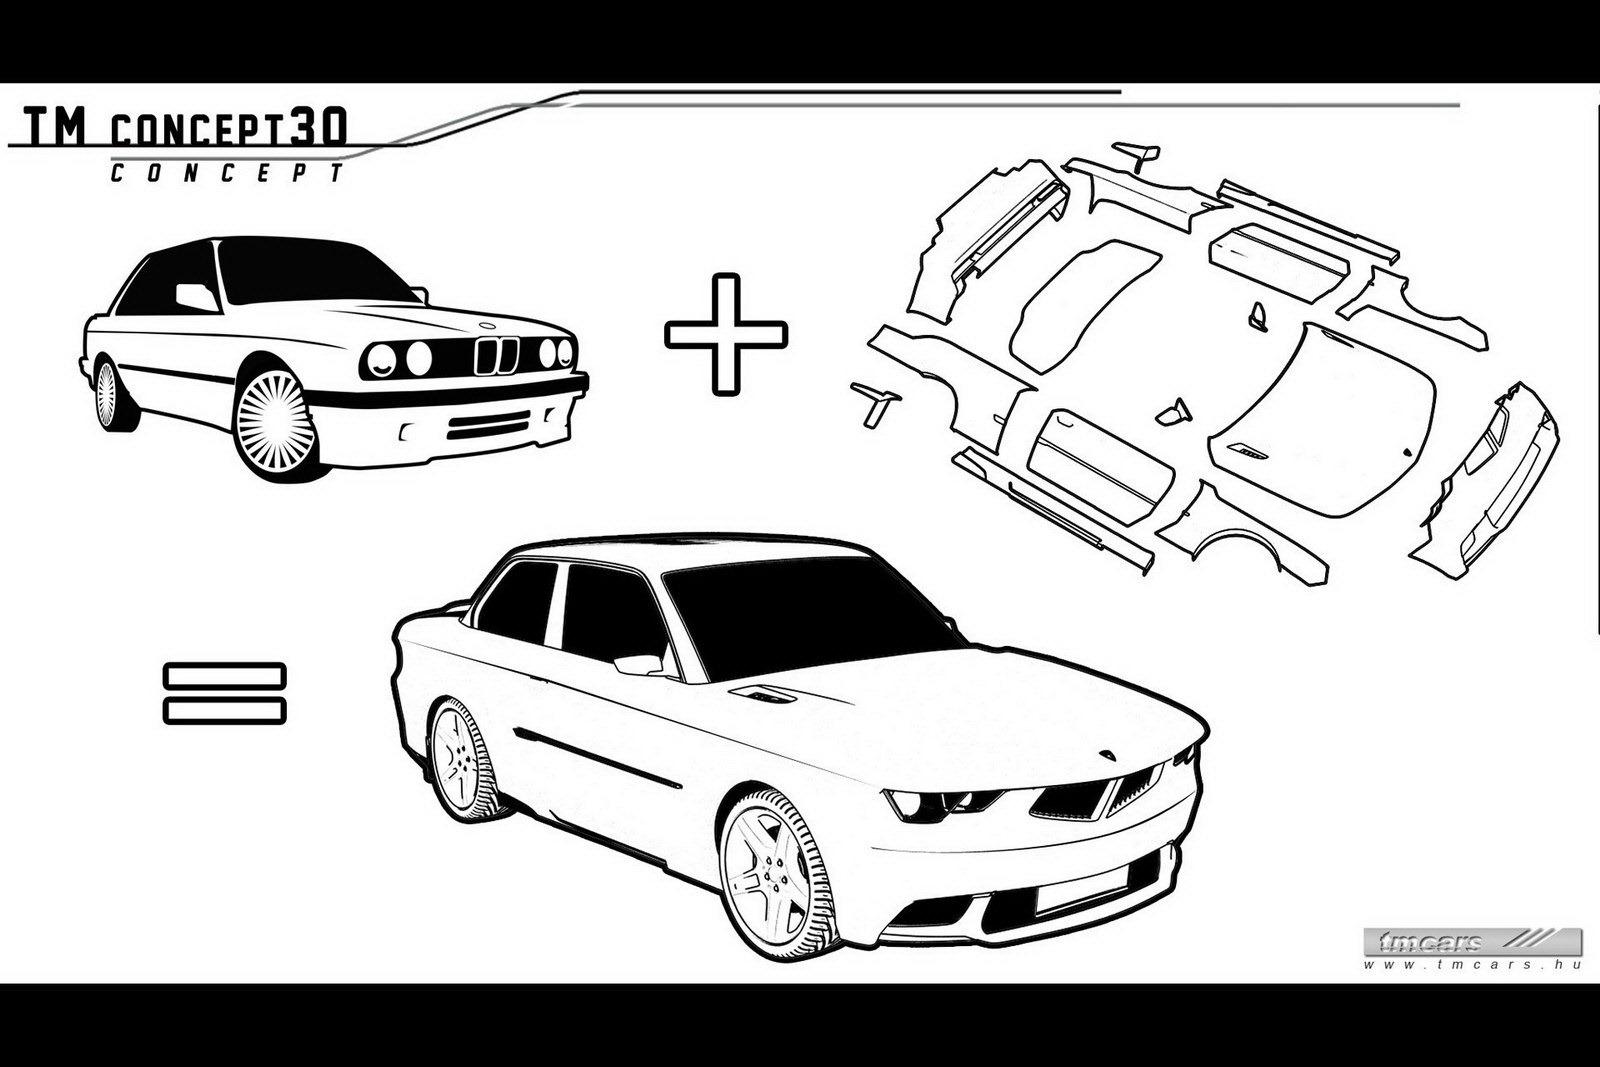 Tmcars Puts Neo Retro Style Into Bmw E30 3 Series With Tm